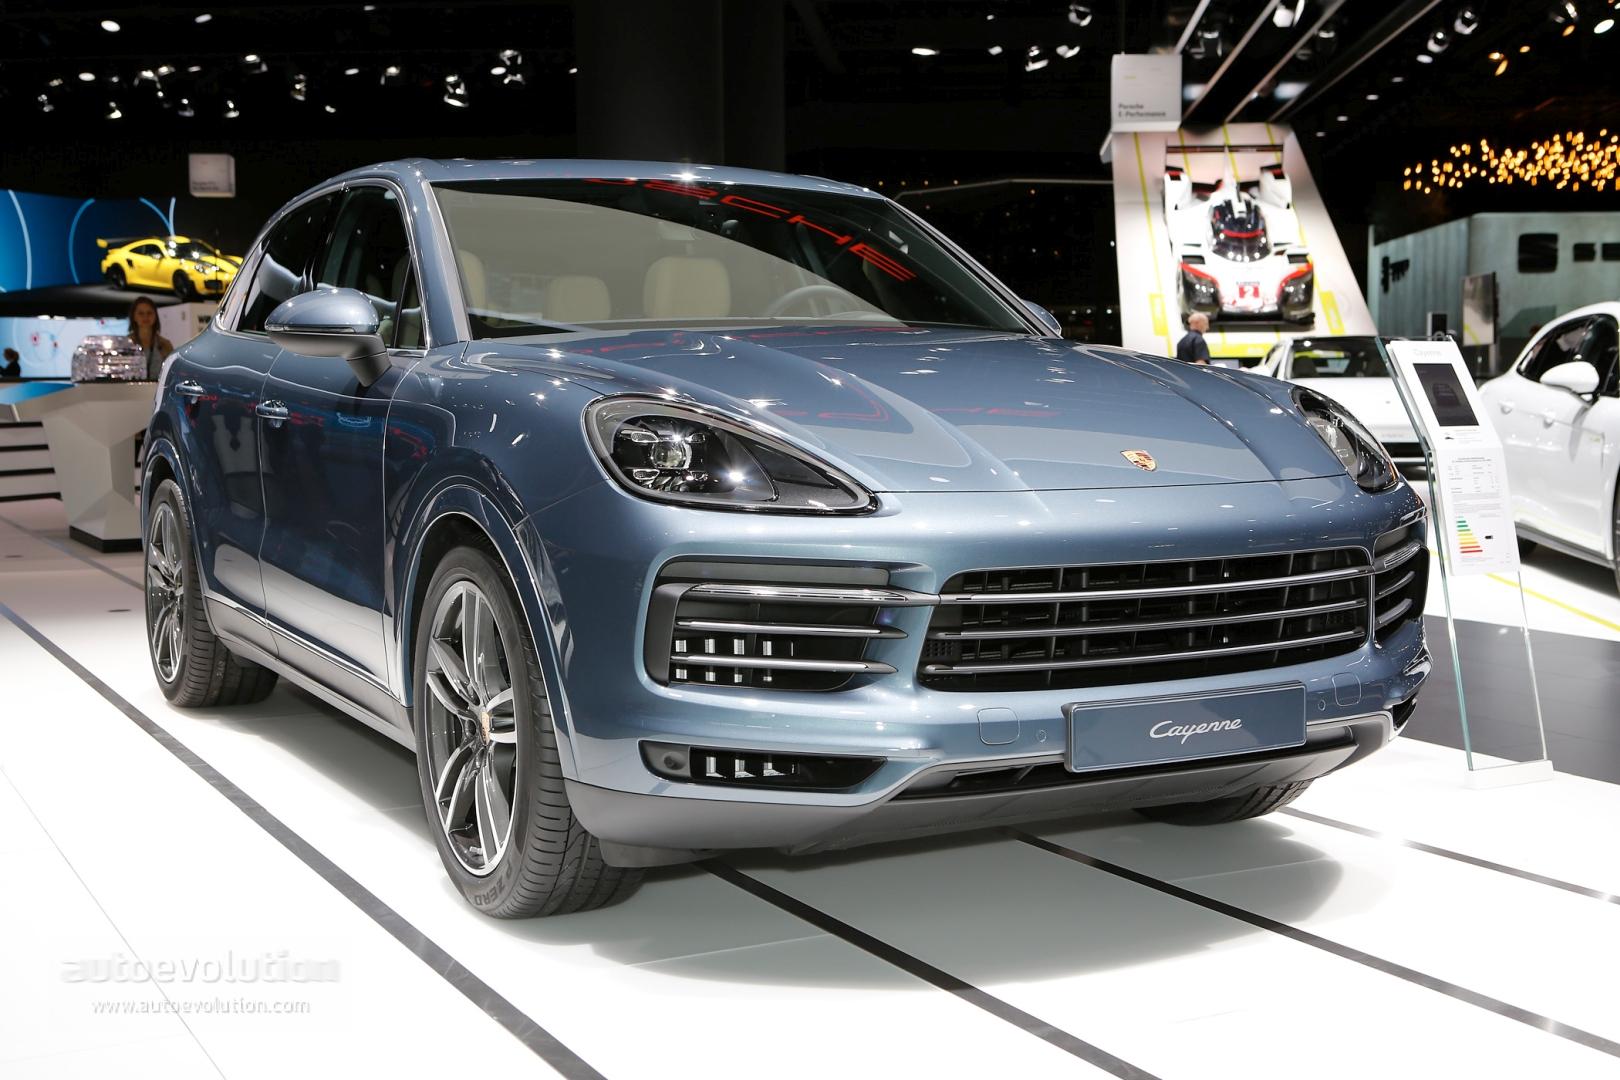 New Porsche Cayenne Might Get A V6 Diesel After All